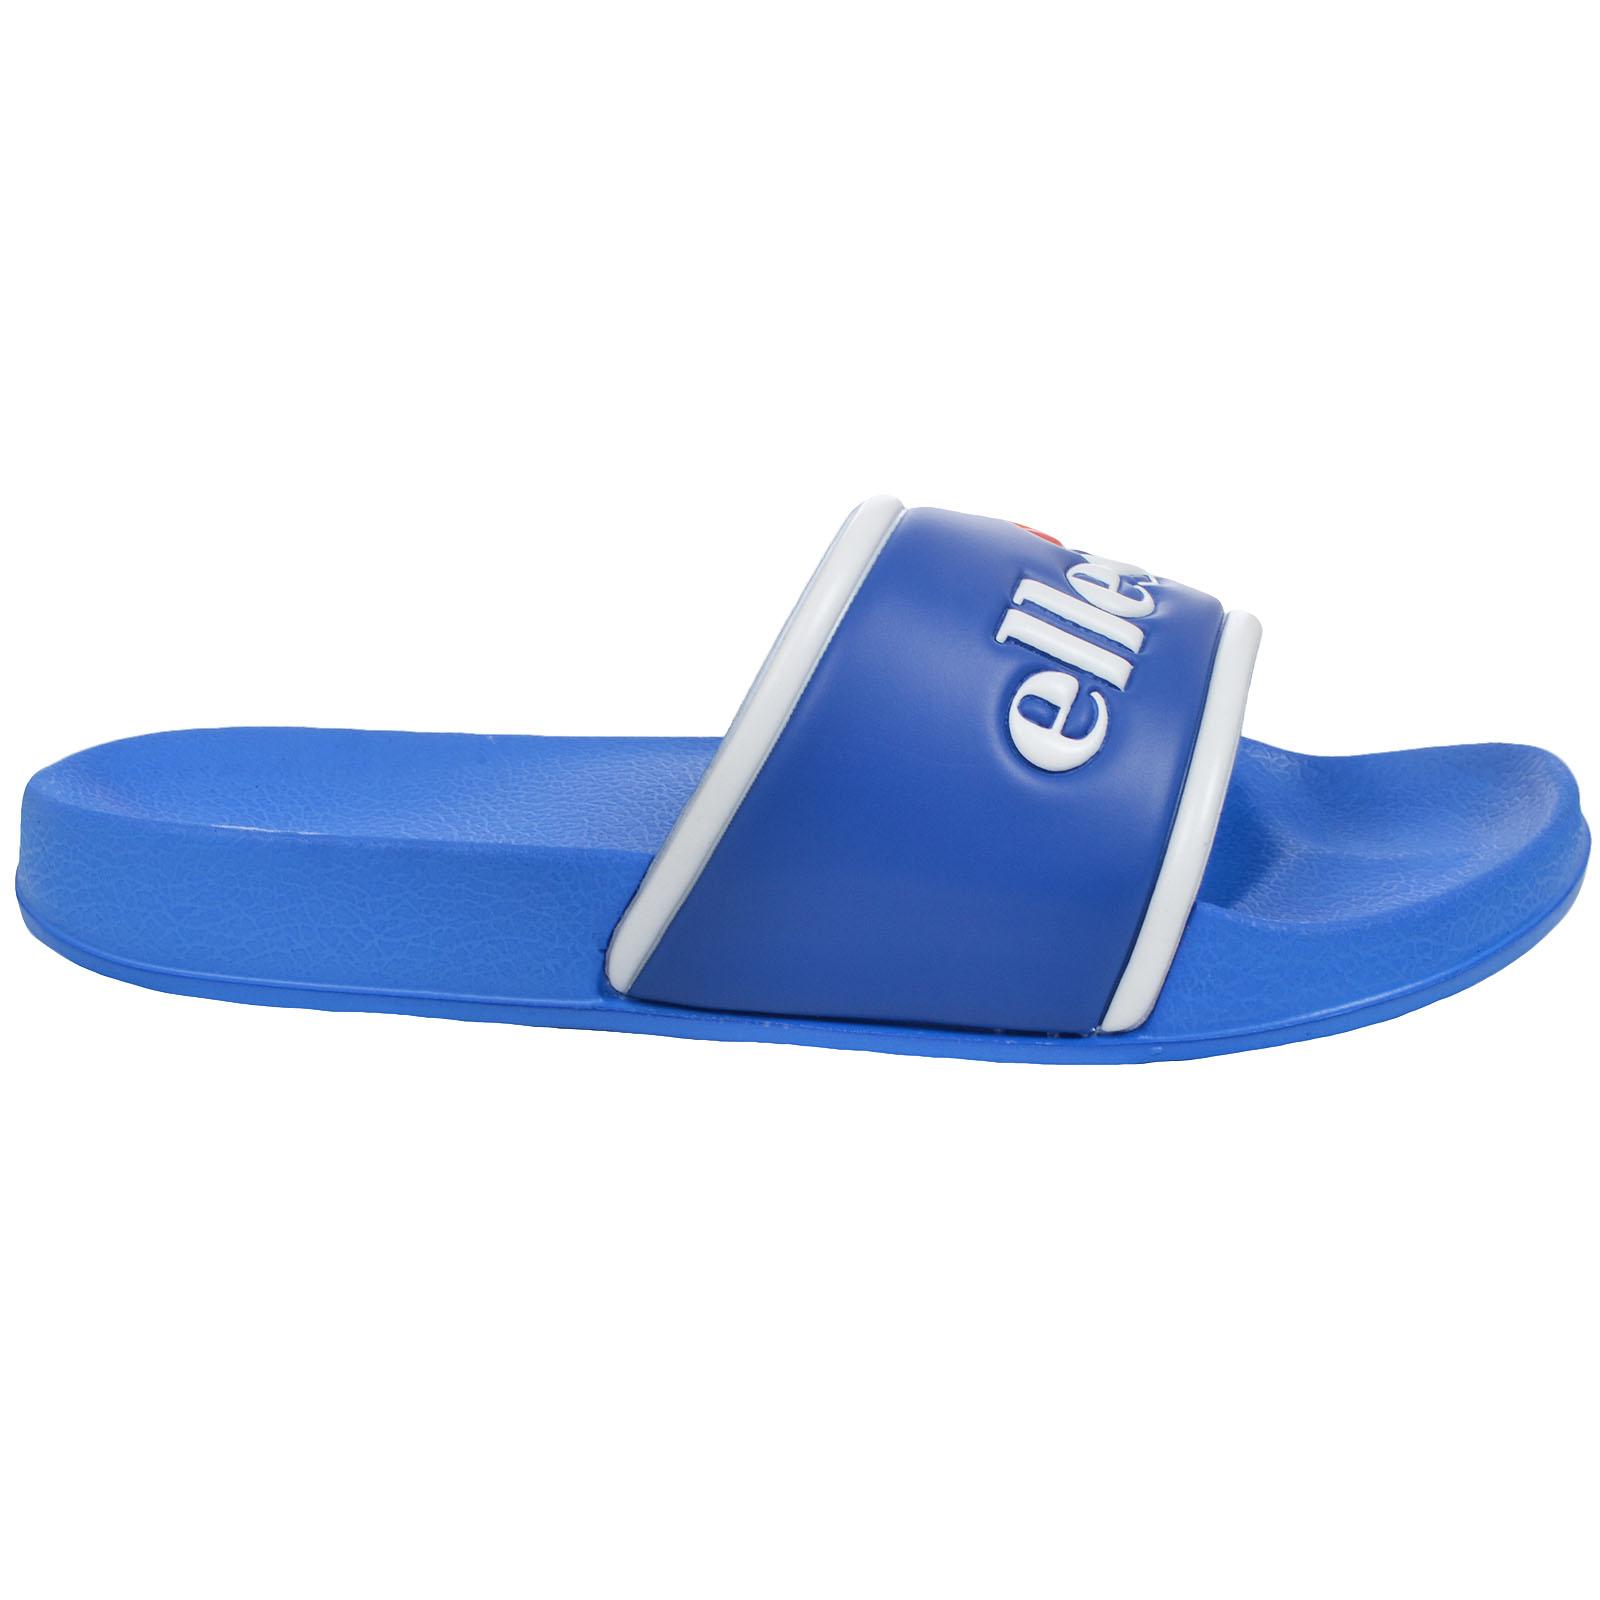 Ellesse-Mens-Julian-Slides-Flip-Flops-Pool-Summer-Slip-On-Sliders-Sandals